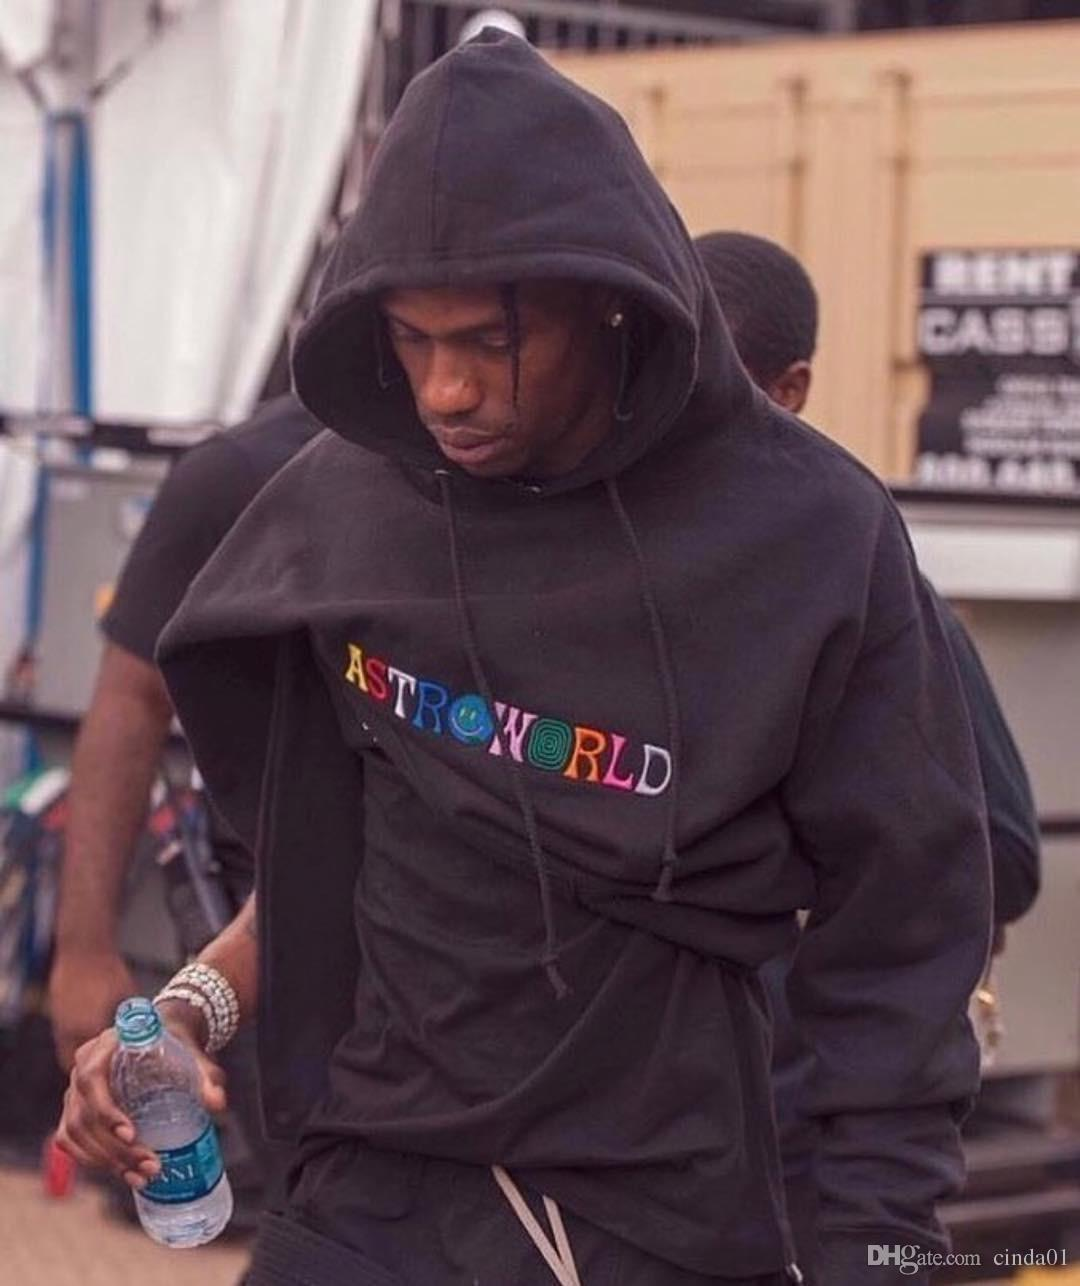 Rapçi Travis Scott Astroworld Hip Hop Kapüşonlular Casual Kapşonlu Sweatshirt Erkek Baskılı High Street Kazak